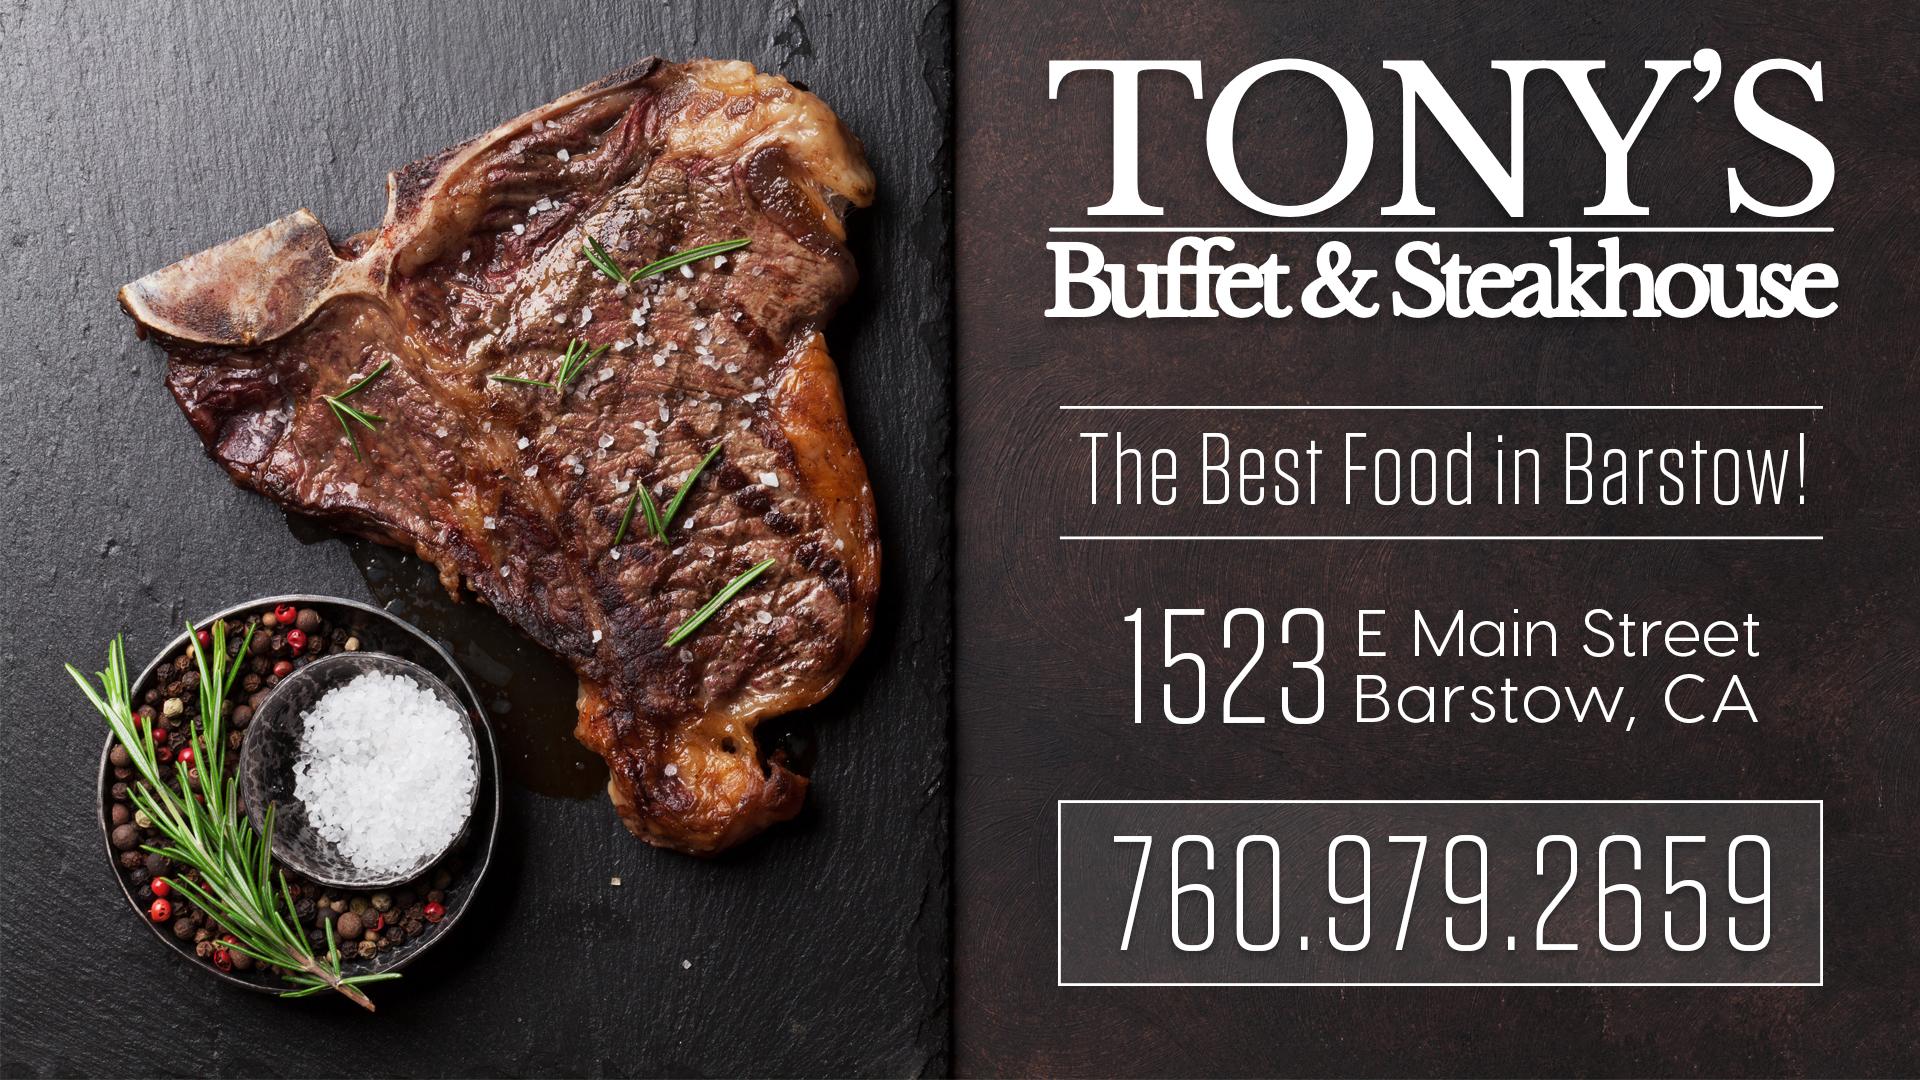 TonysBuffet&Steakhouse.jpg